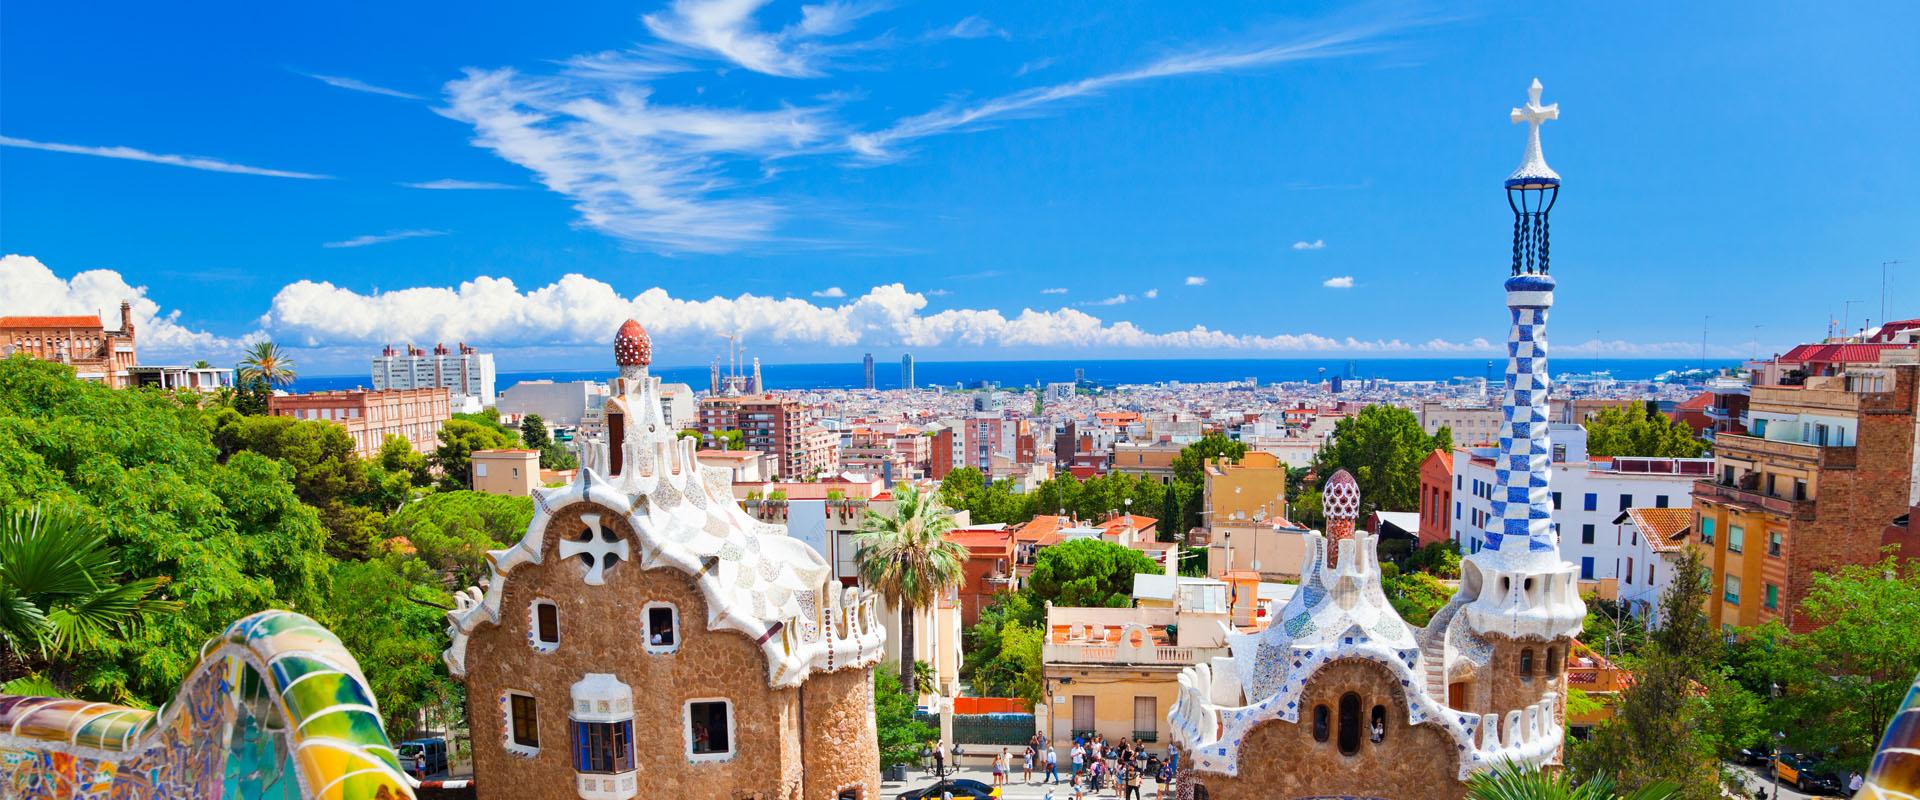 Barcelona - Aussicht aufs Stadtpanorama und den Park Güell